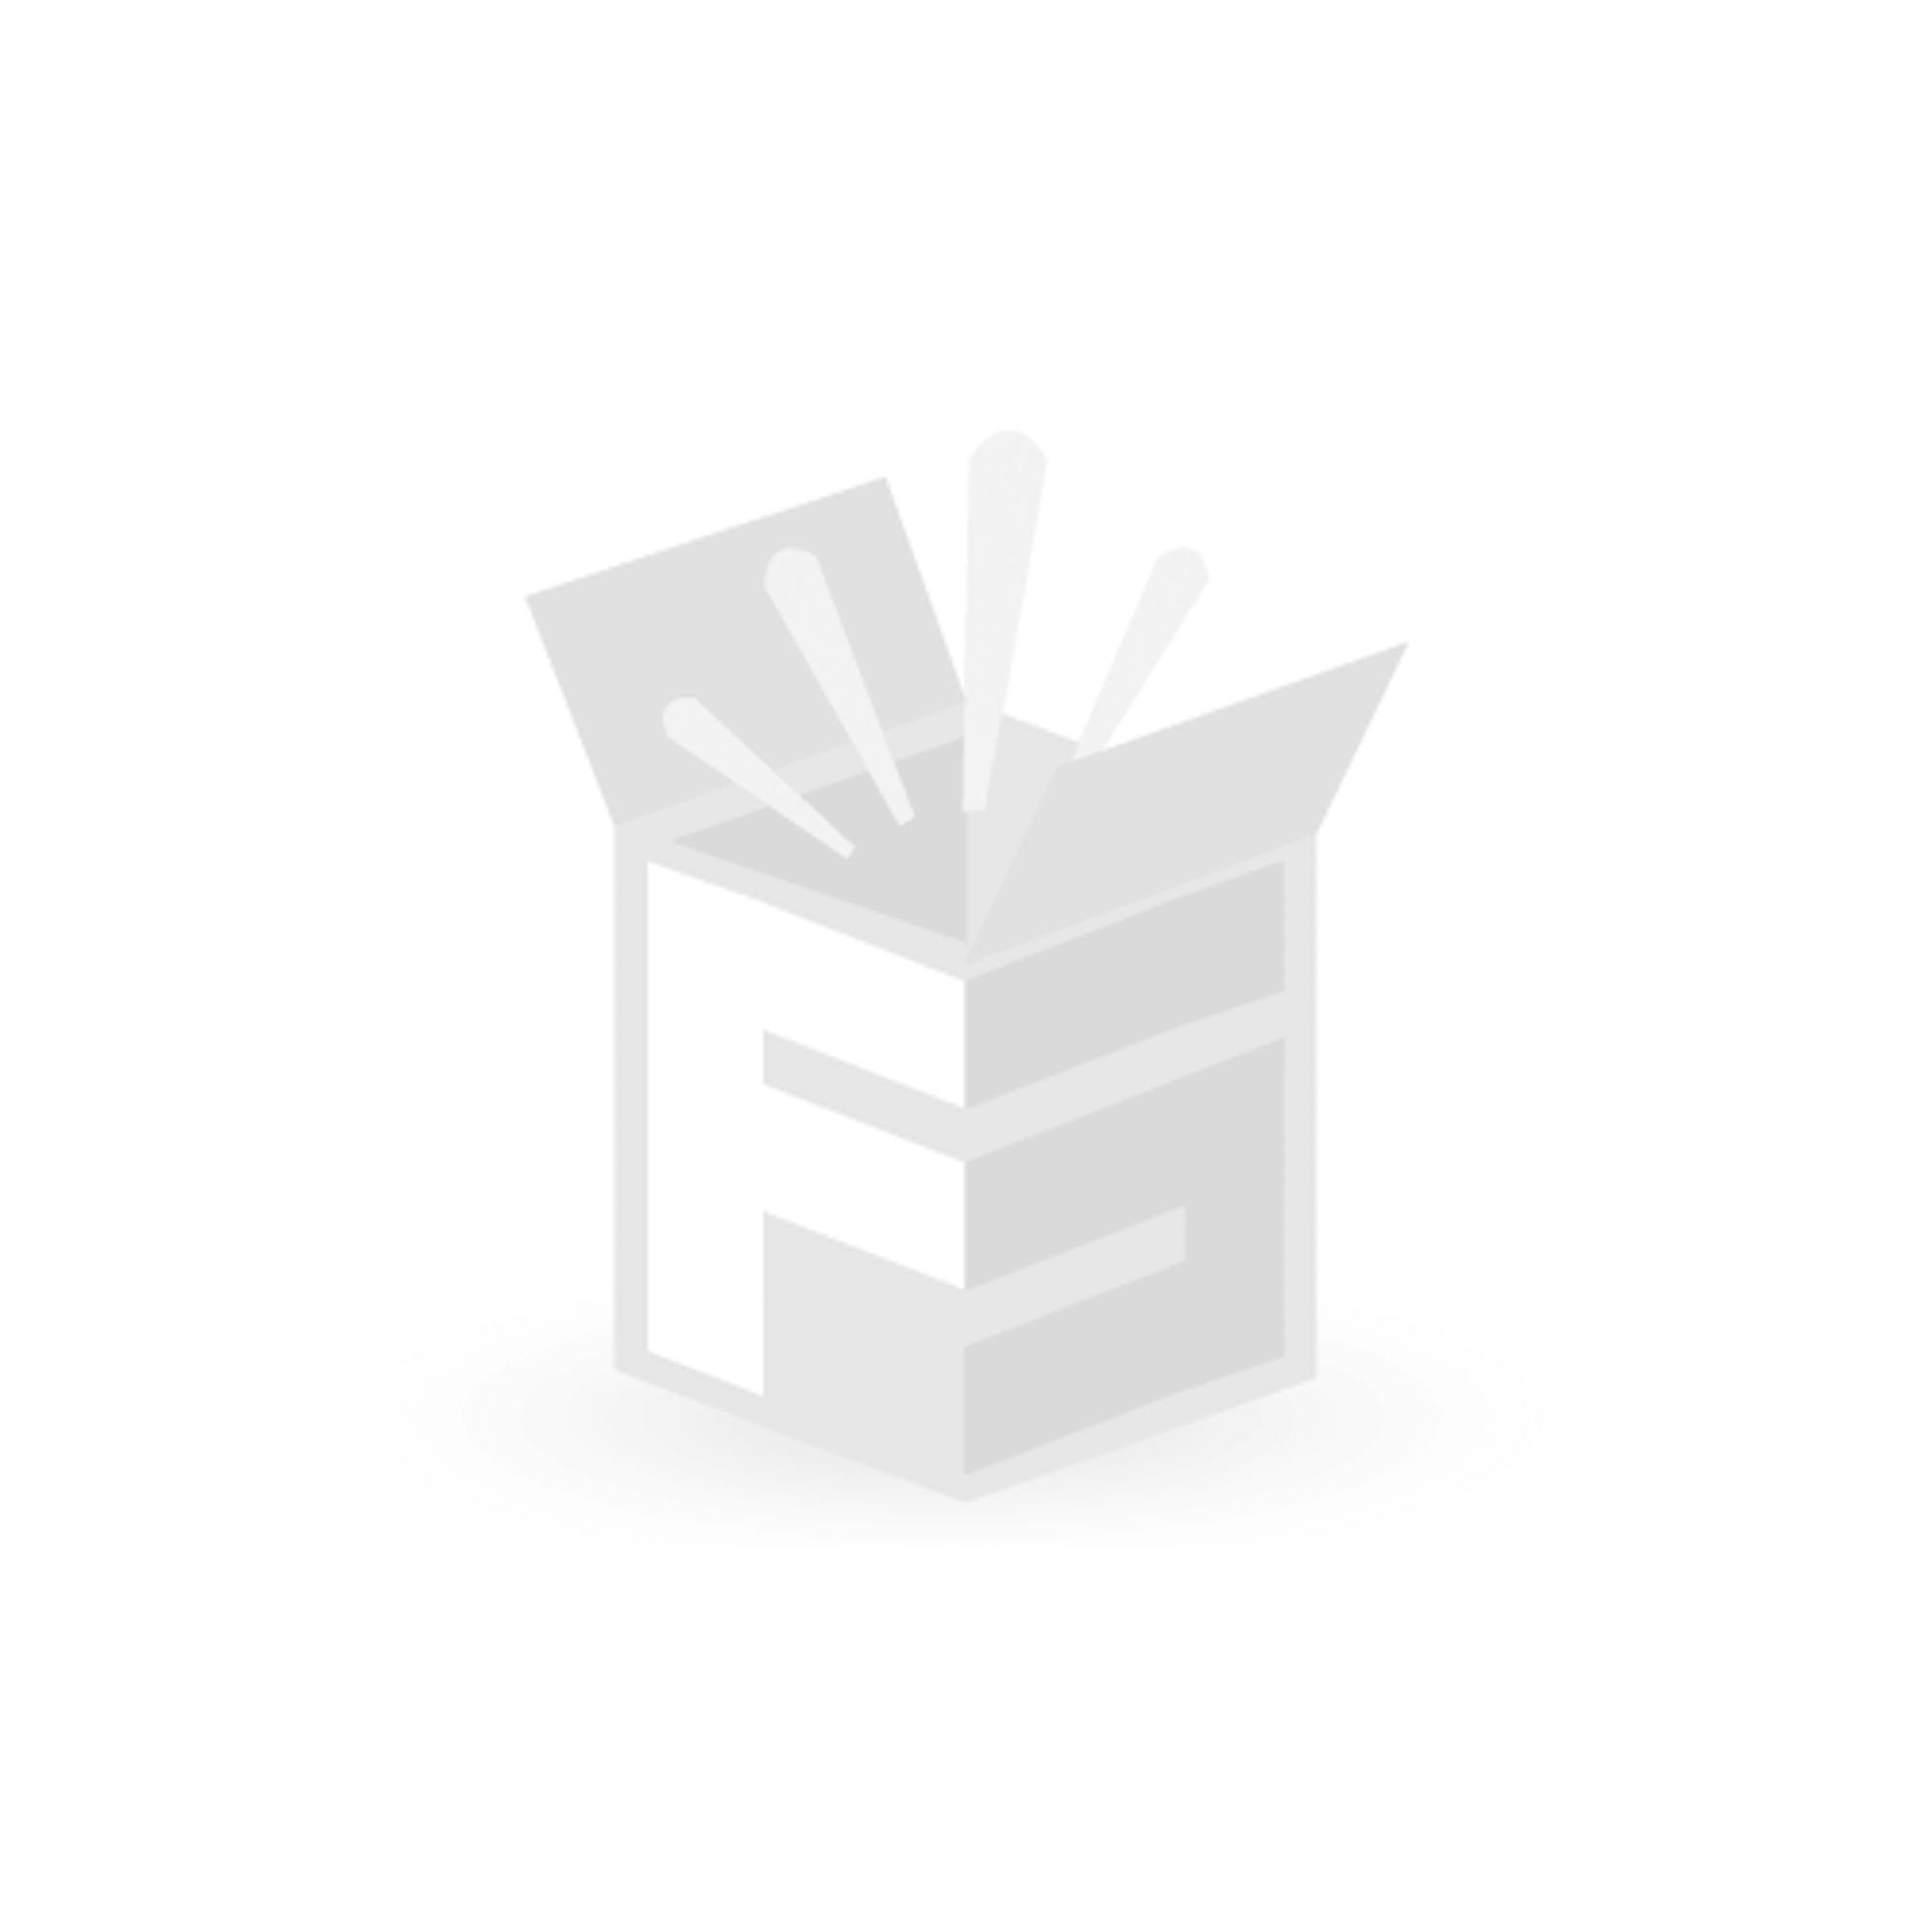 FS-STAR Muffinformen aus Silikon, 8 Stück